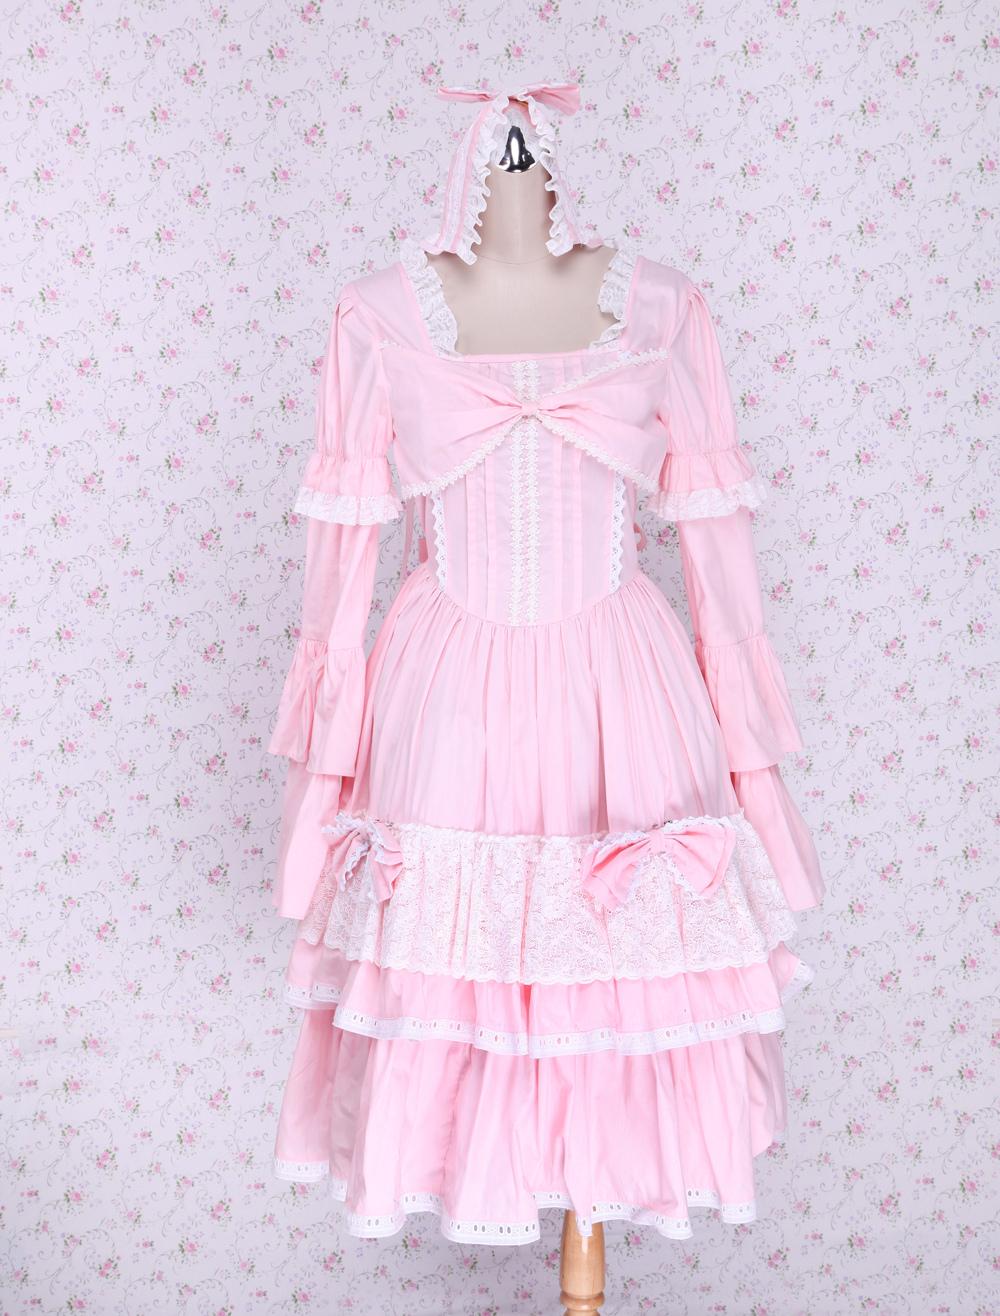 Best Gothic Lolita Dresses Buy Gothic Lolita Dresses At